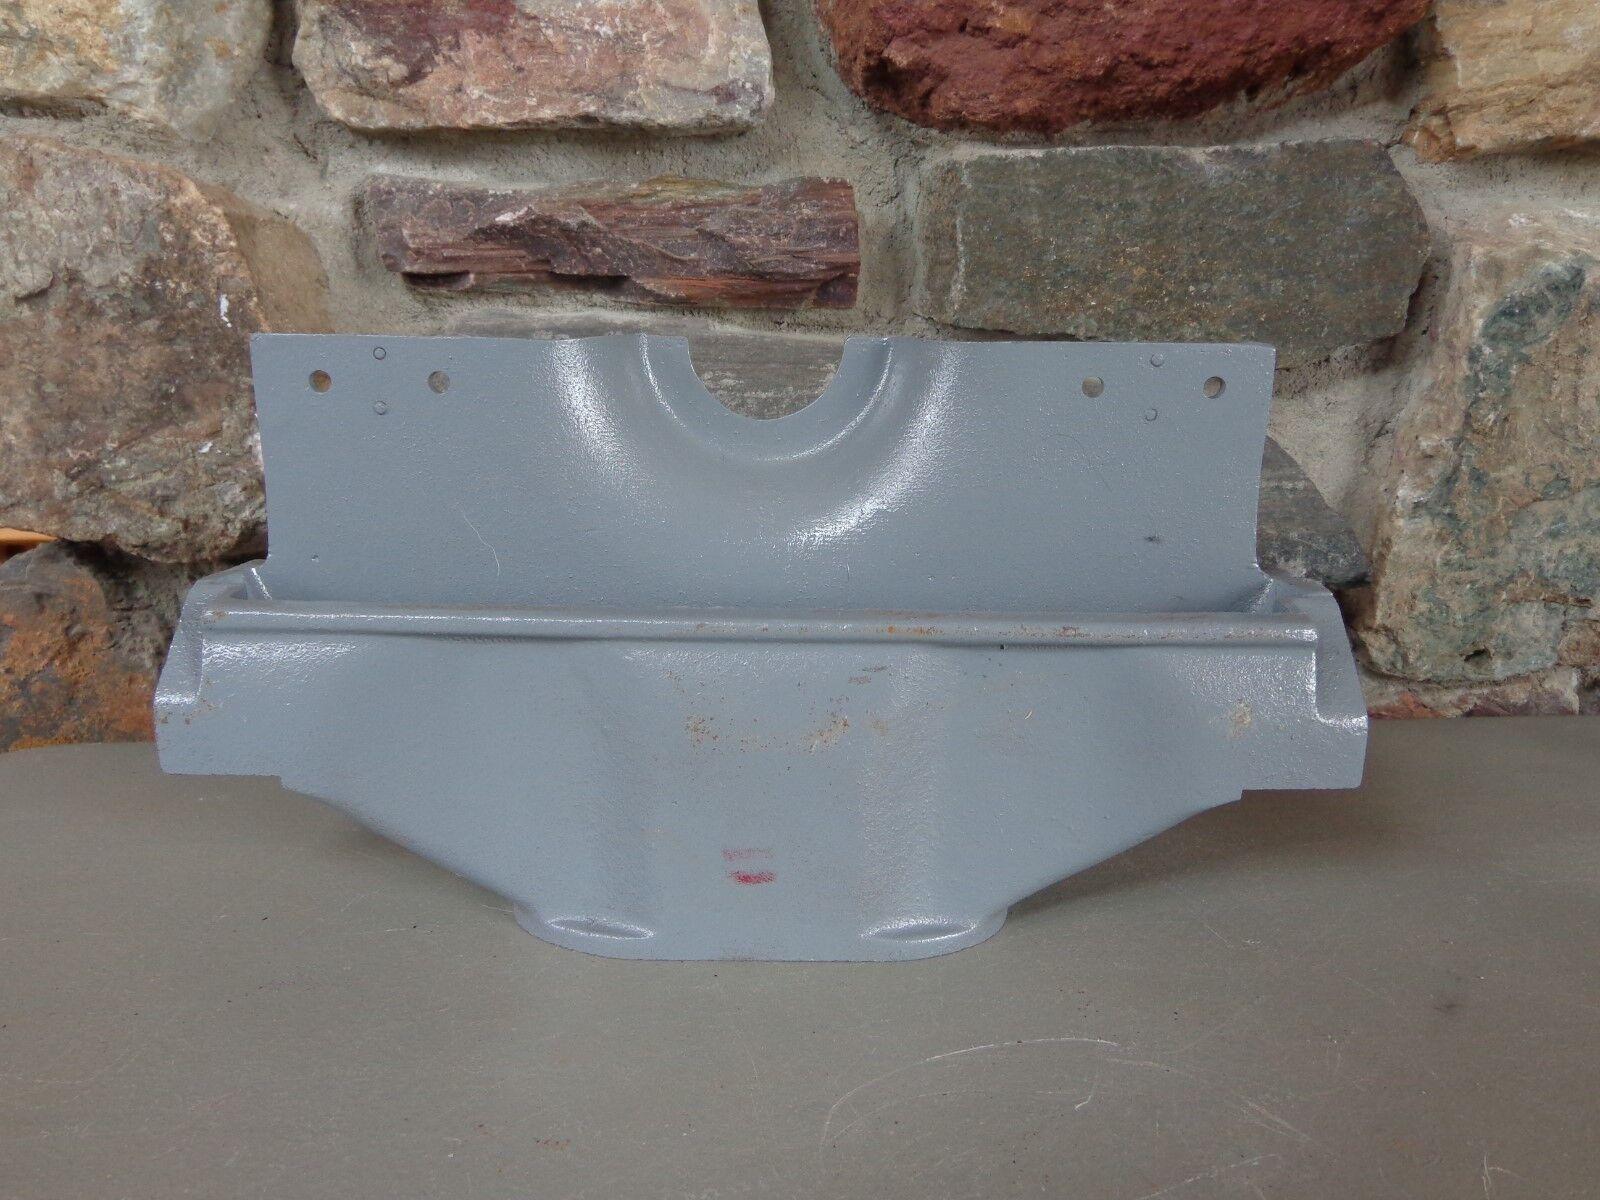 Vtg Used Delta Rockwell 6 x 48 Belt Sander Lower Casting Sandblasted Repainted 2